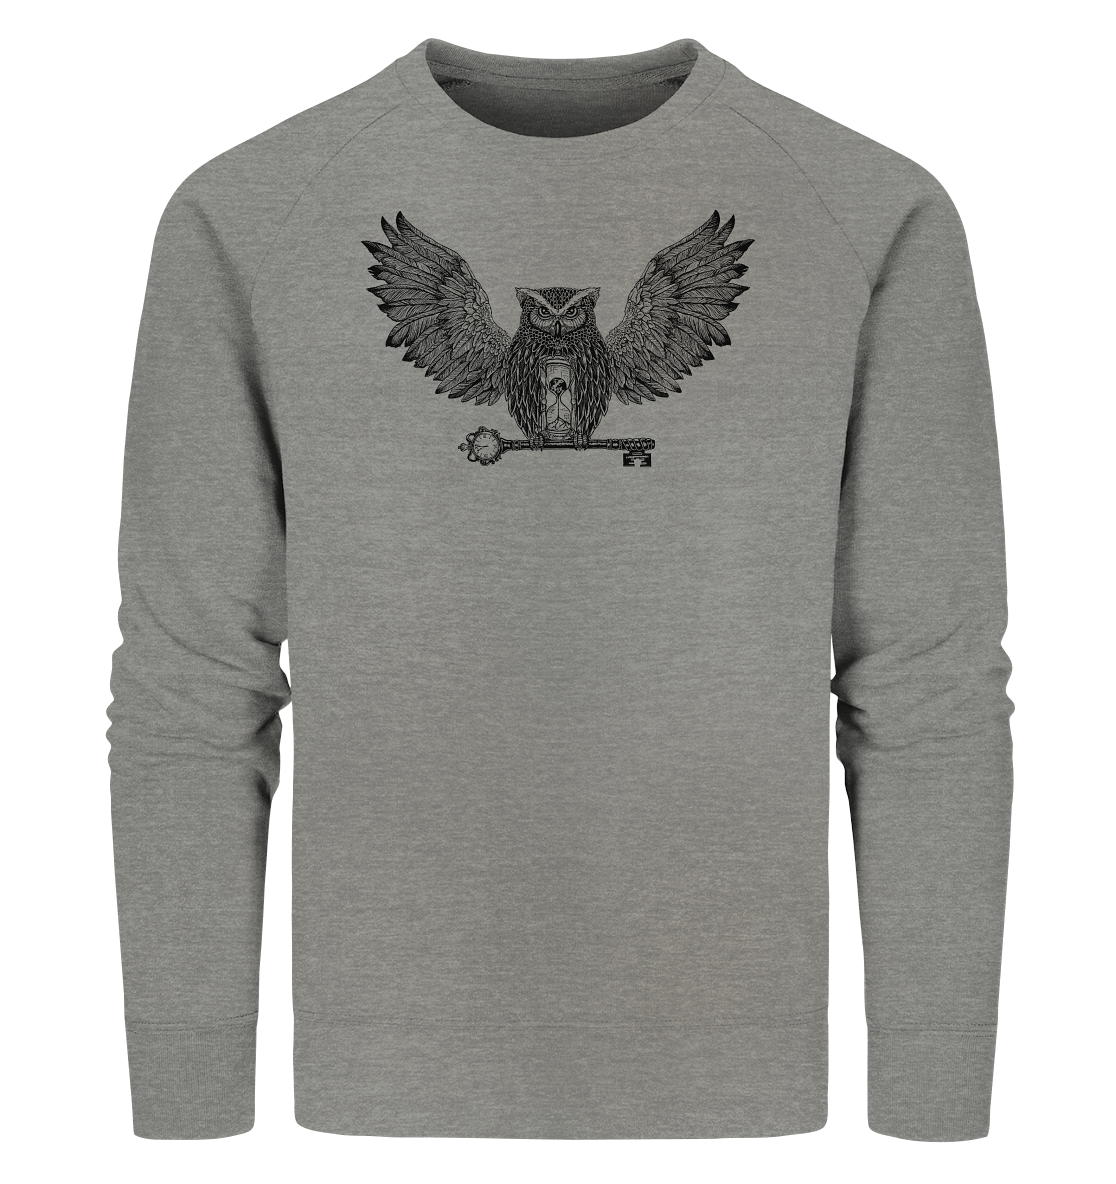 front-organic-sweatshirt-818381-1116x-5.png